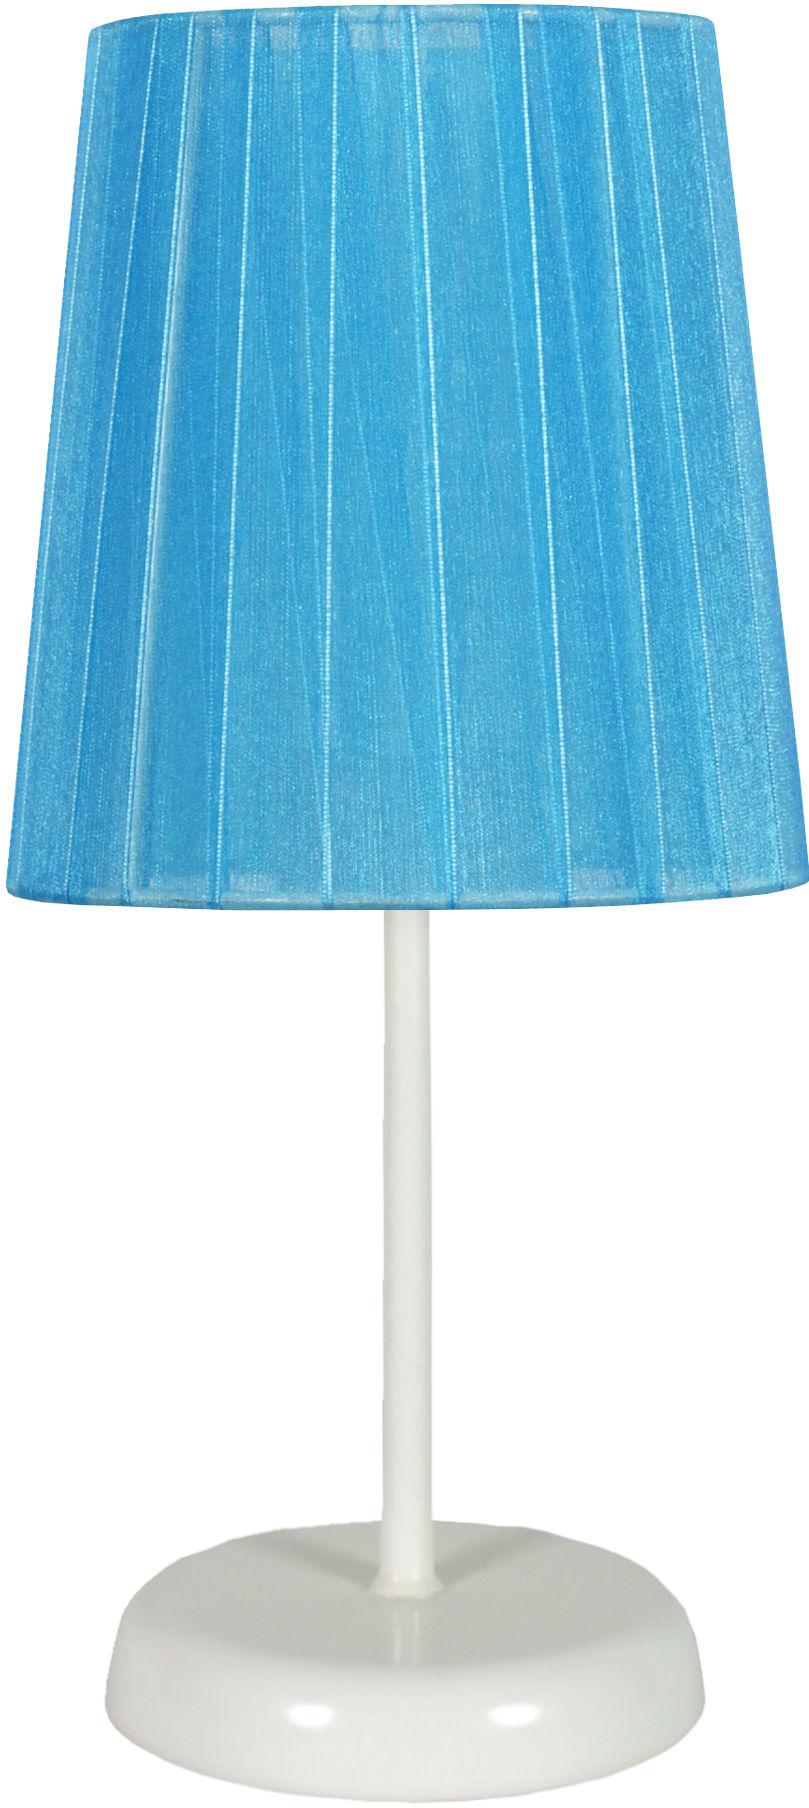 Candellux RIFASA 41-30603 lampa stołowa abażur niebieska 1X40W E14 14 cm